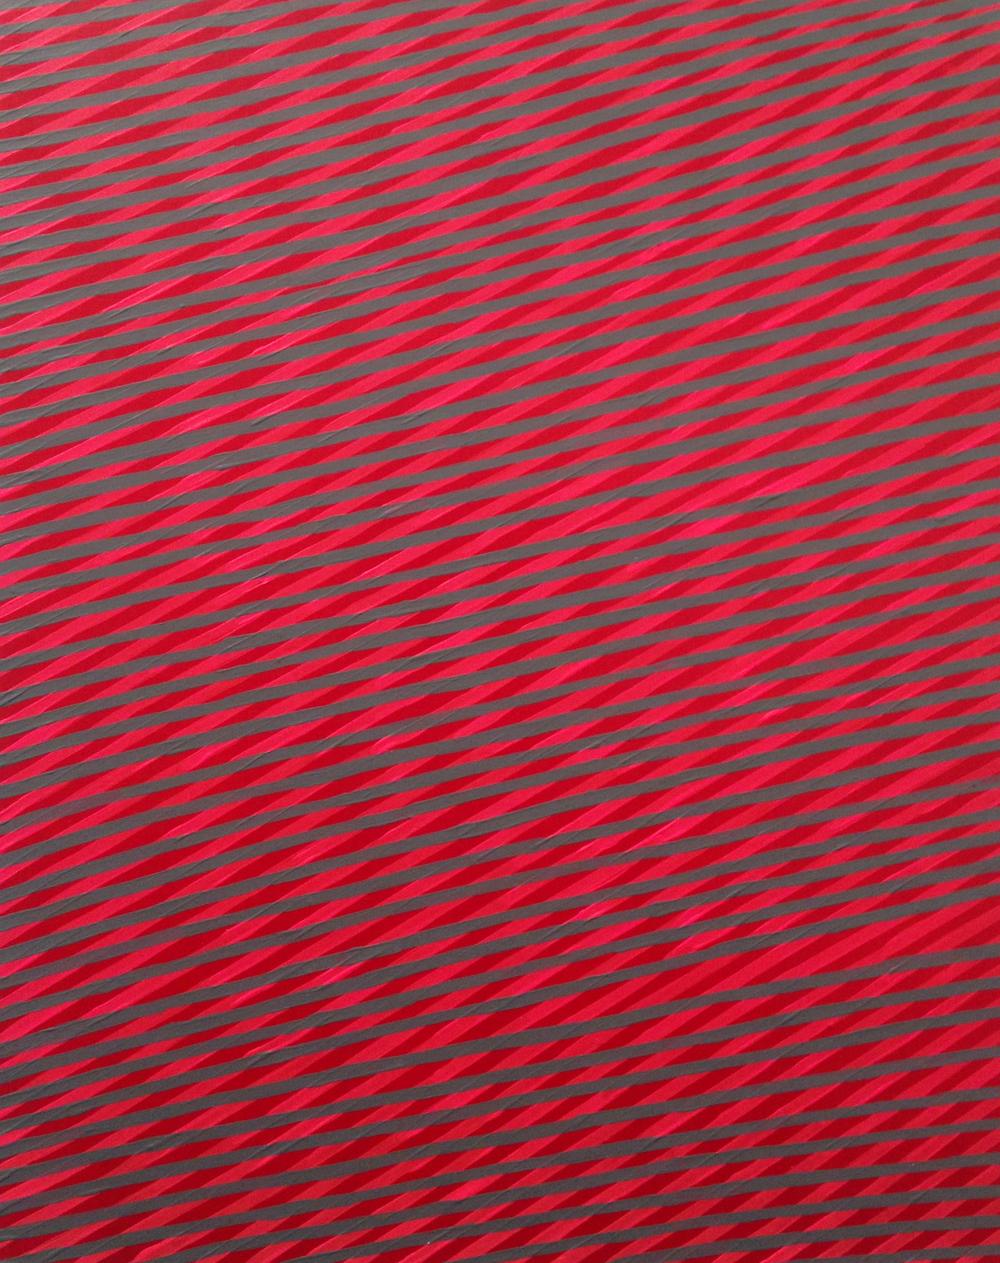 Mel Prest, Violen Dank, 2013, acrylic on panel, 14 x 11 x 2 inches